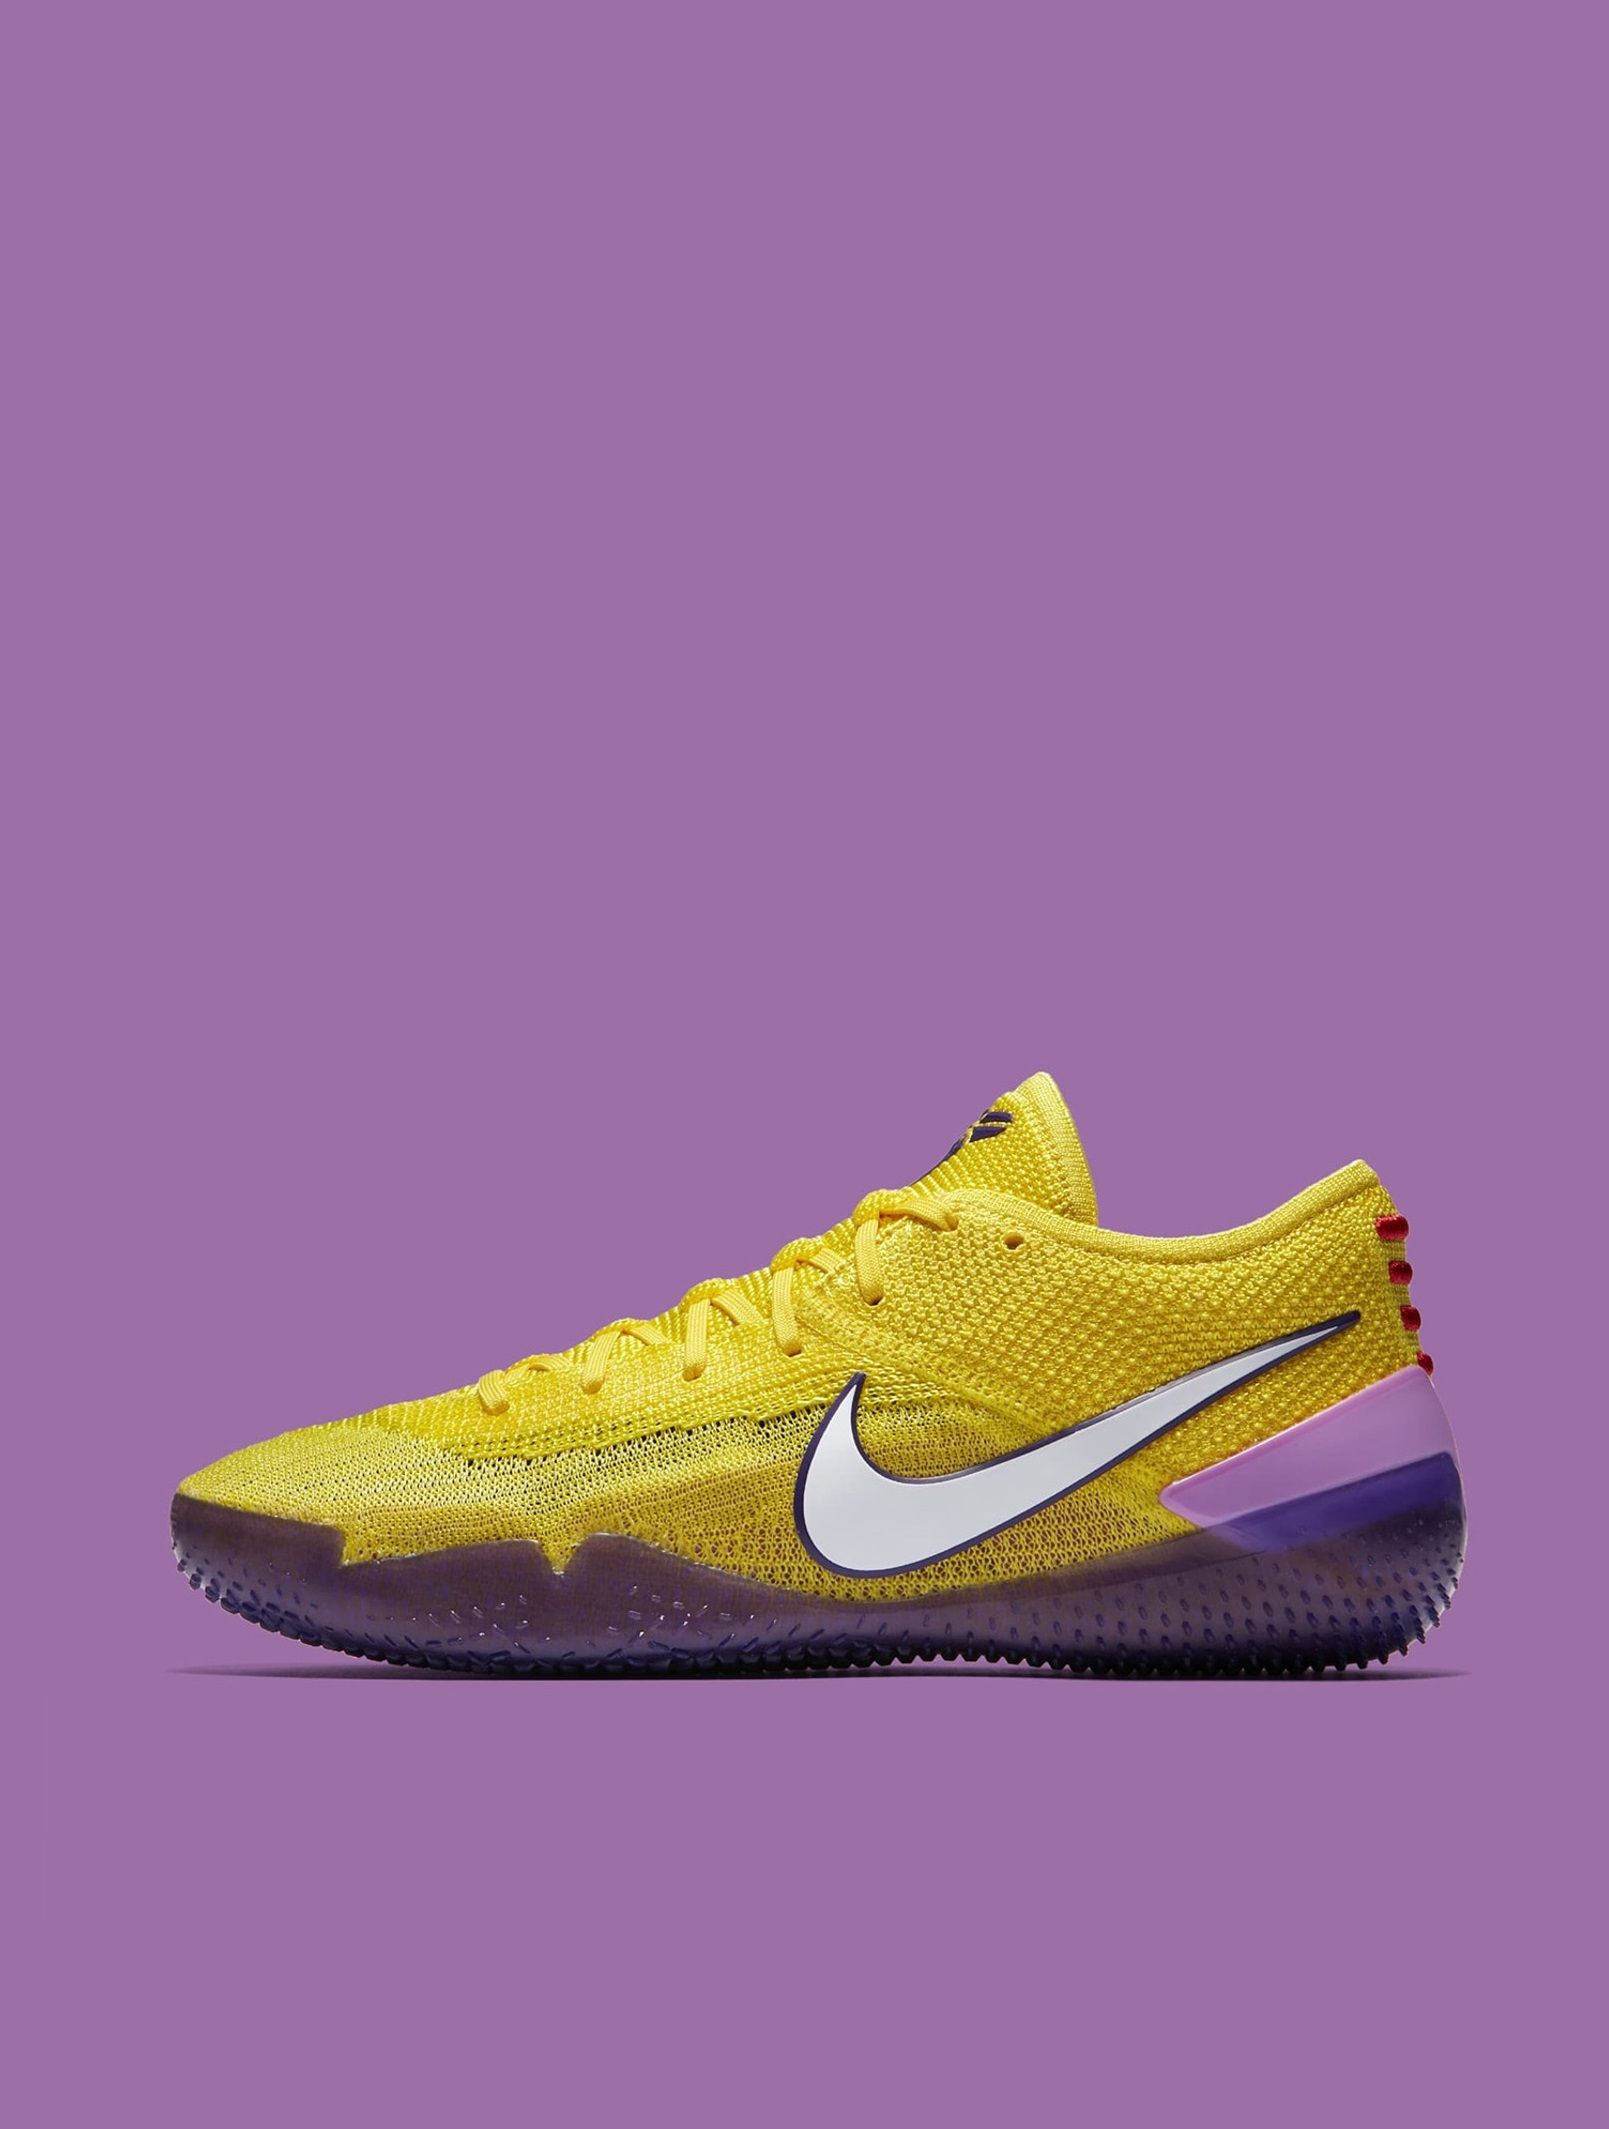 wholesale dealer 90951 811b6 Nike Kobe AD NXT 360